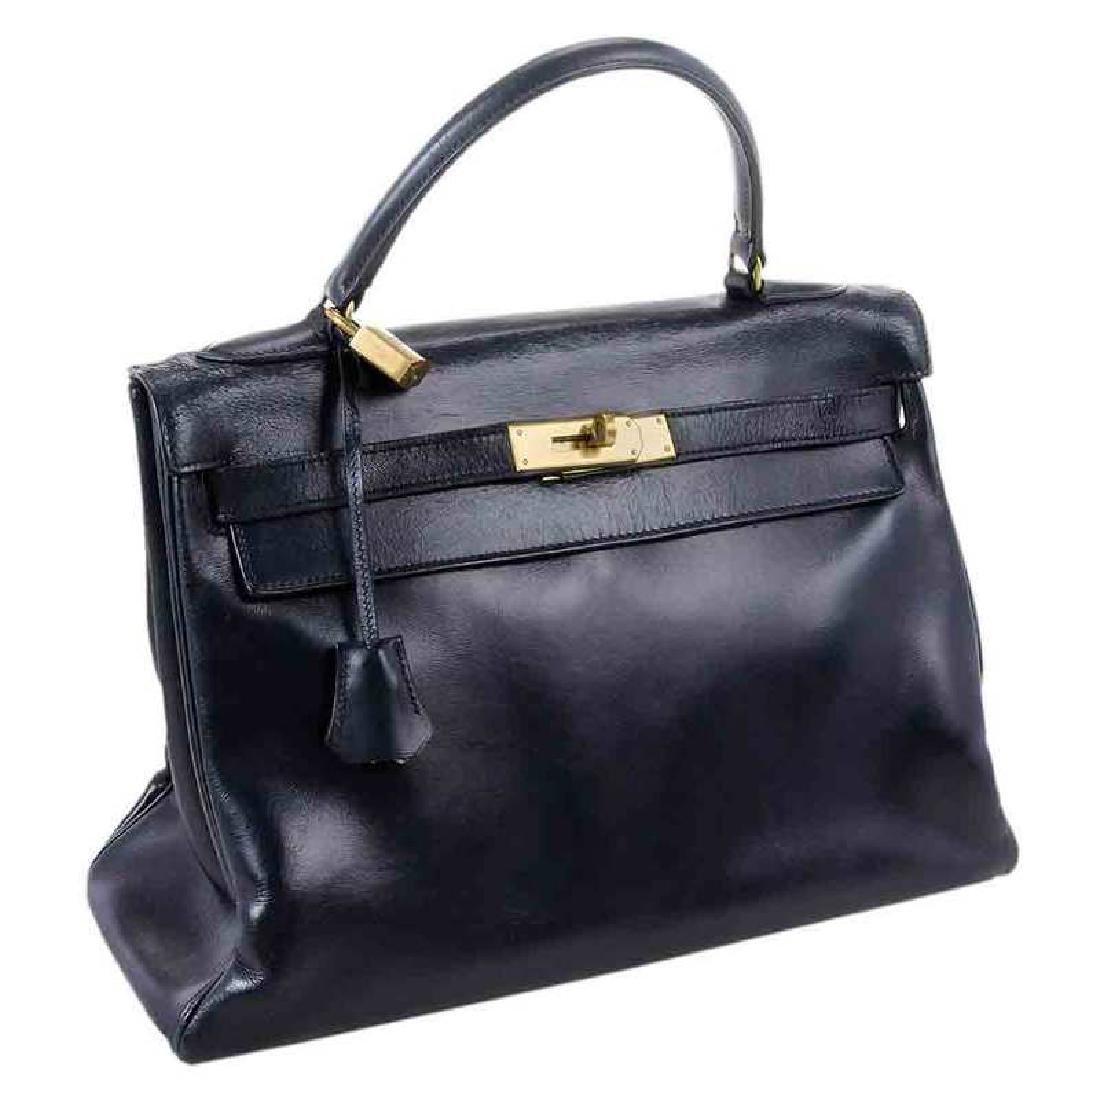 Hermes Blue Leather Kelly Handbag